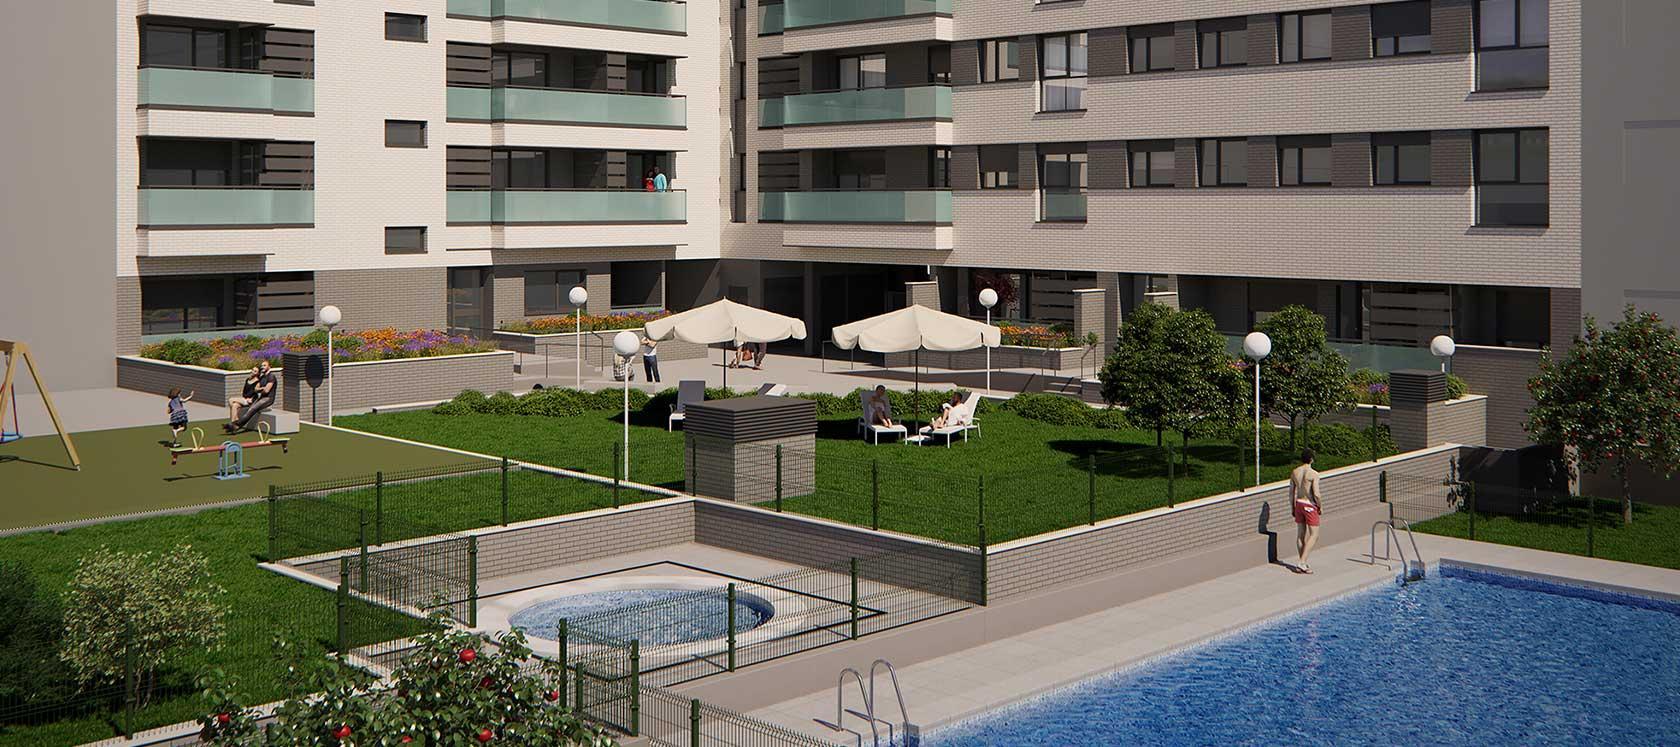 New build in Torrejón de Ardoz Célere River